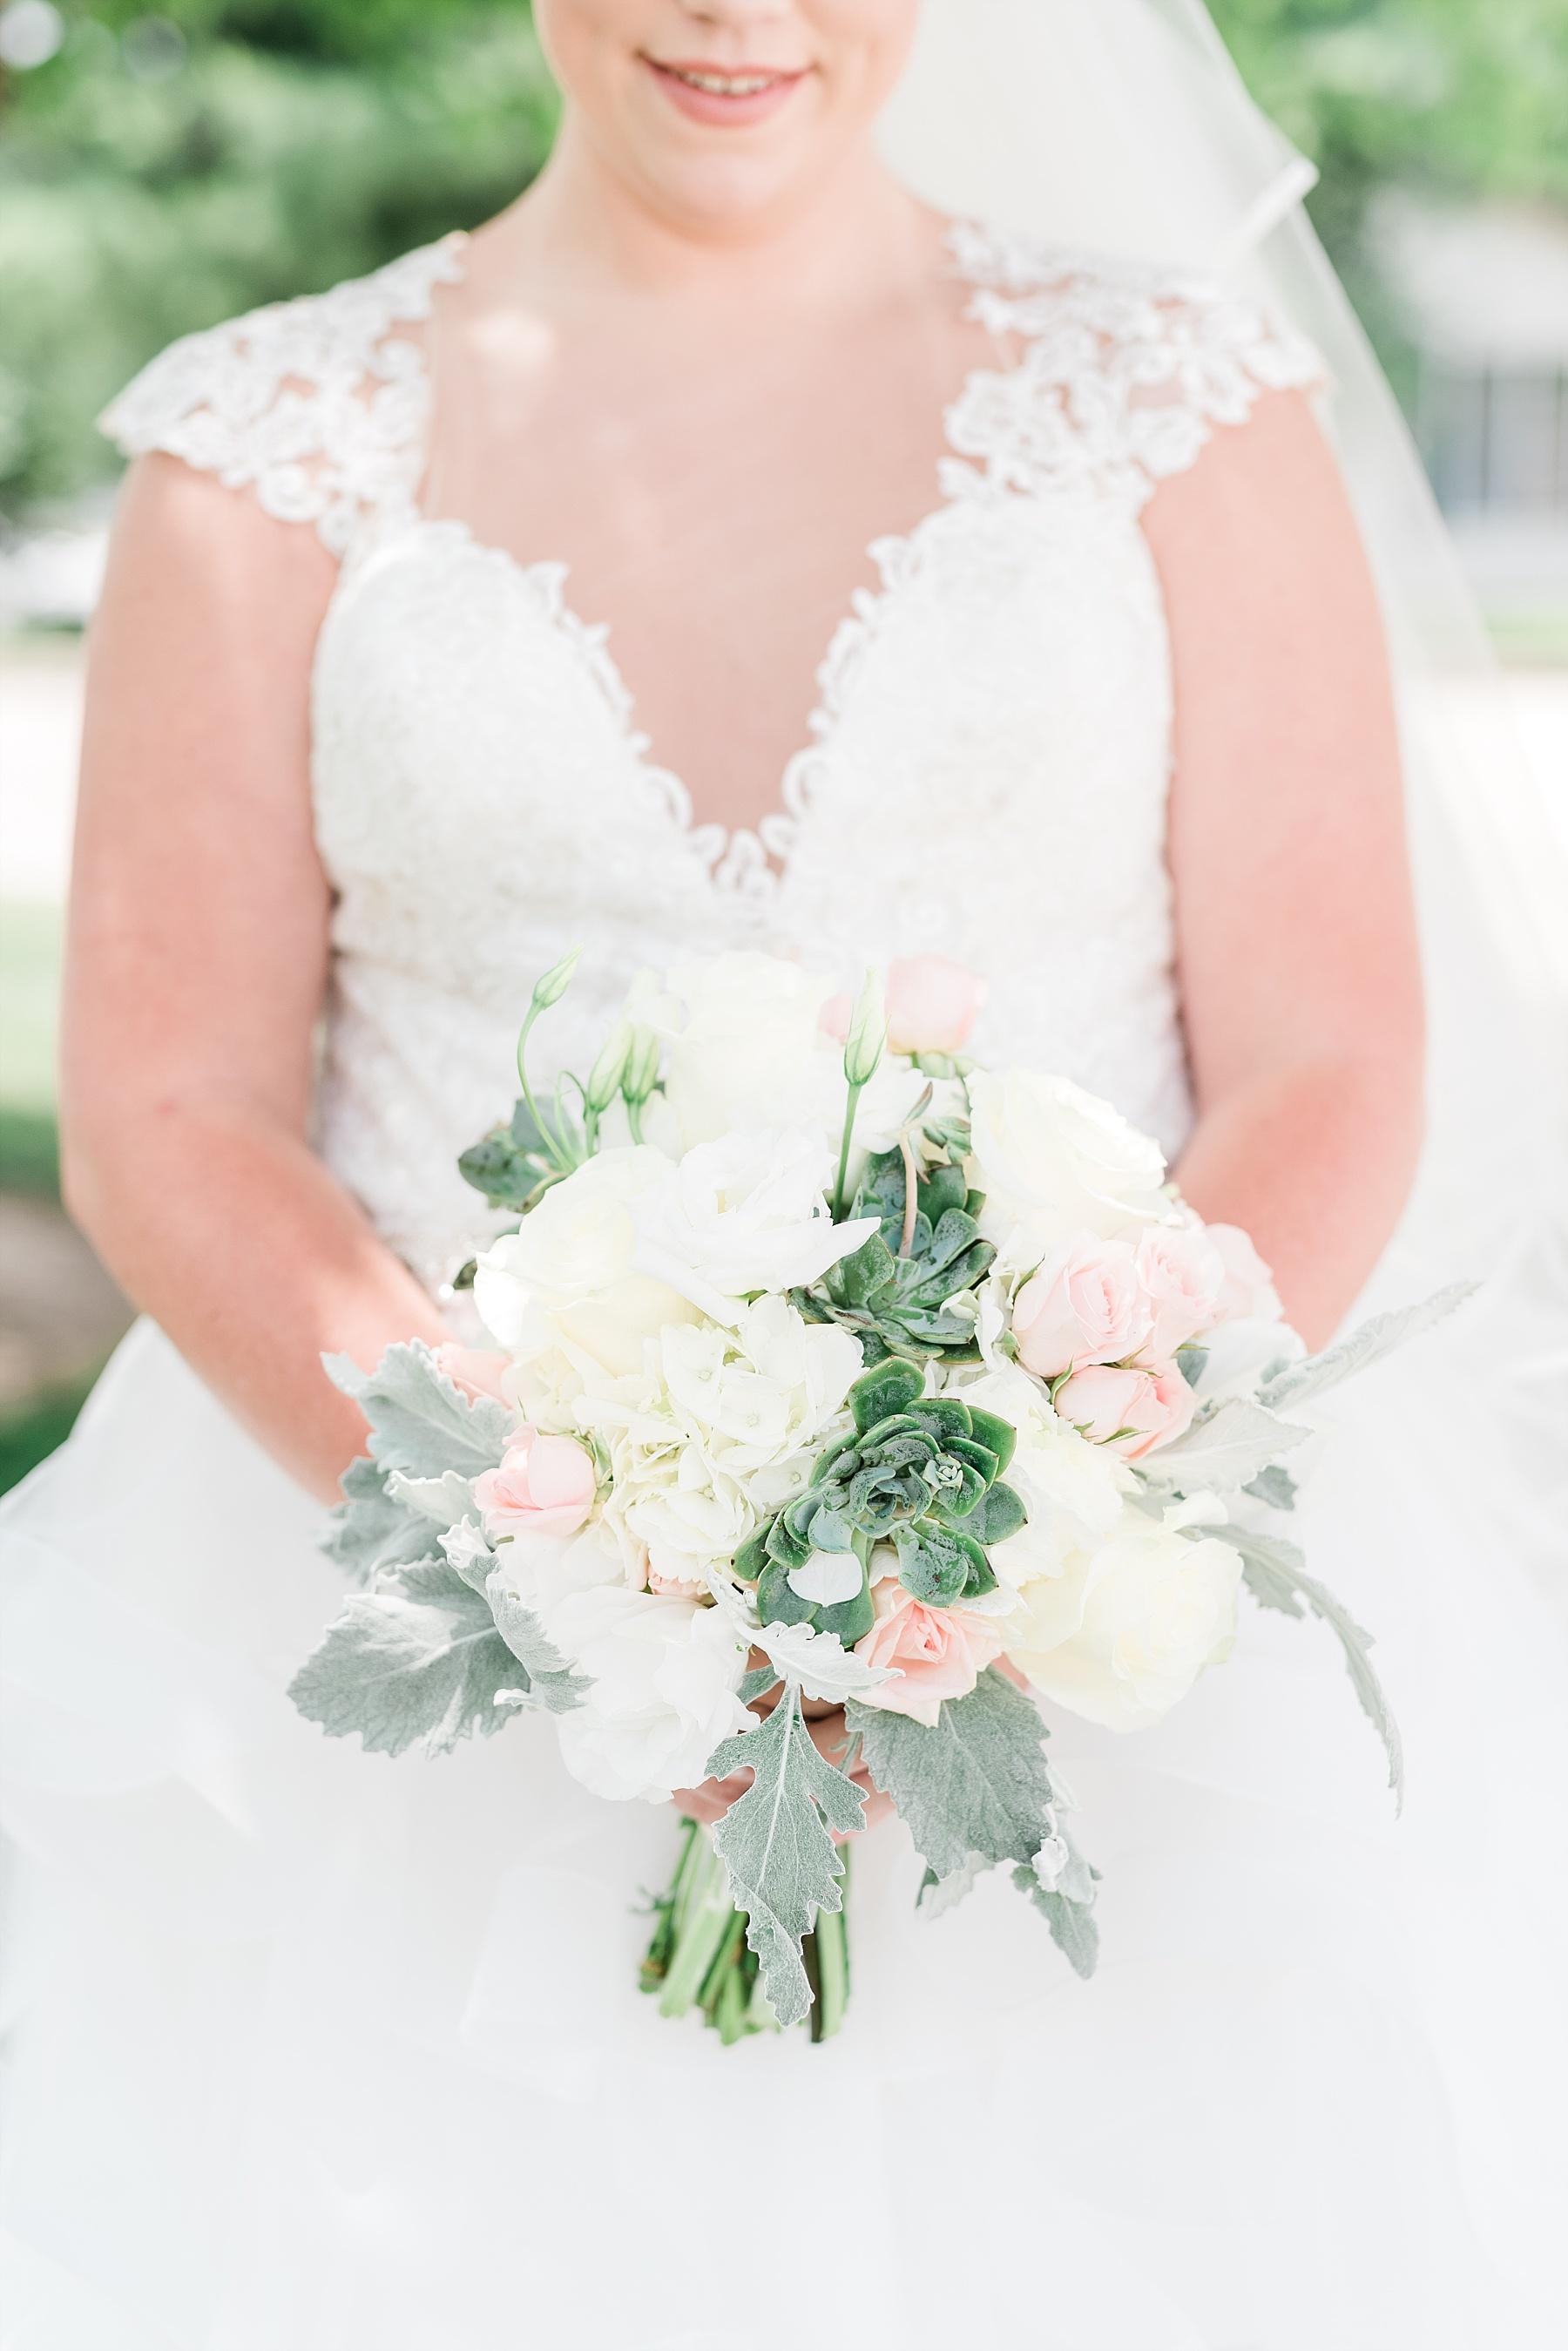 Baurichter Wedding at Stoney Creek Inn Columbia Missouri by Kelsi Kliethermes Photography_0003.jpg